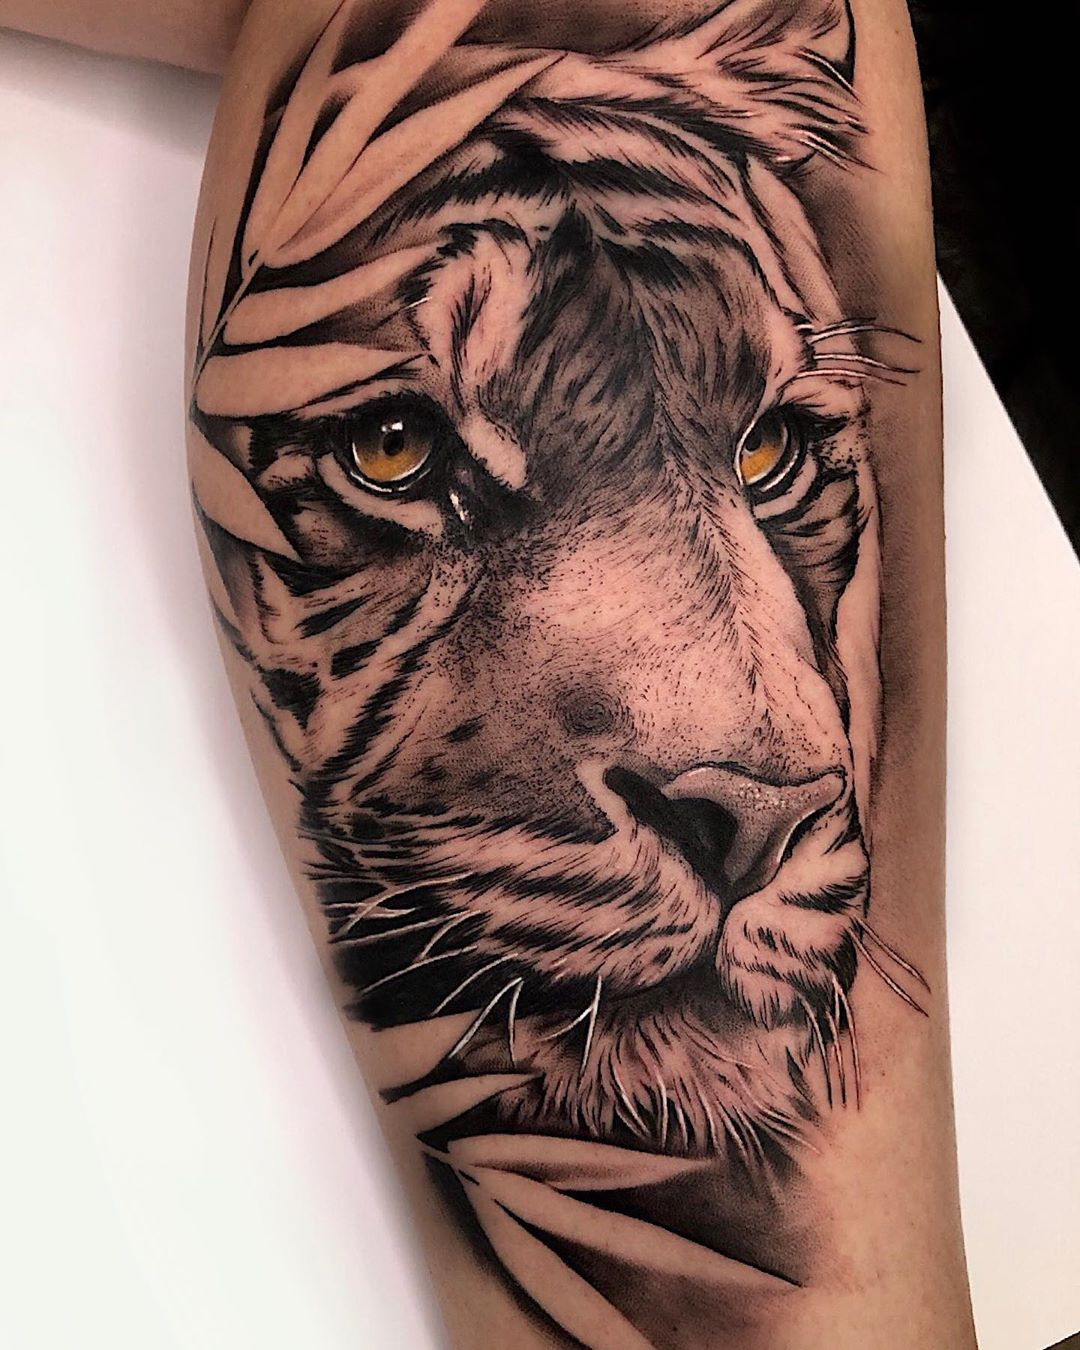 ink,inktattoo,tattoostyle,tattoomodels,puertollano,tattooers,ciudadrealsetatua,ink,tatuajes,realismo,realistictattoo,ciudadrealtattoo,tatuajesenpuertollano,traditionaltattoos,castillalamancha,ink,tattooart,zurichtattoo,daimiel,inkedgirls,inkig,ink,inktattoos